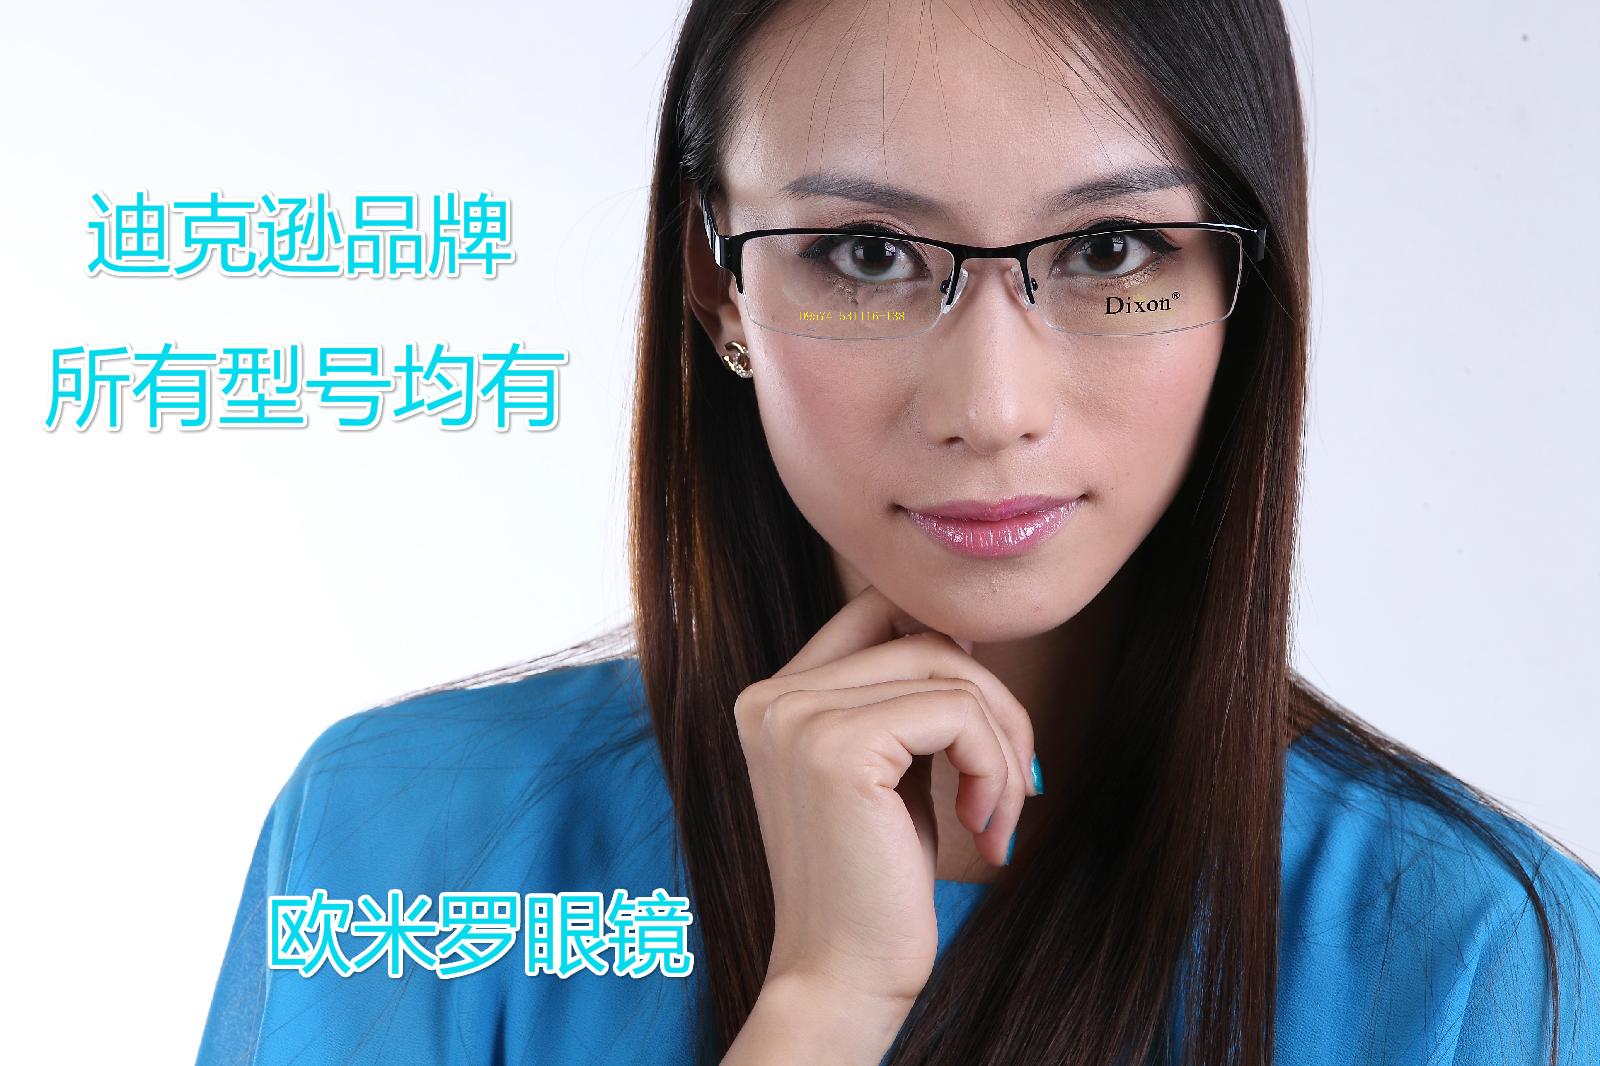 [Dixon]迪克逊镜架 超轻板材加金属半框眼镜配近视大框黑